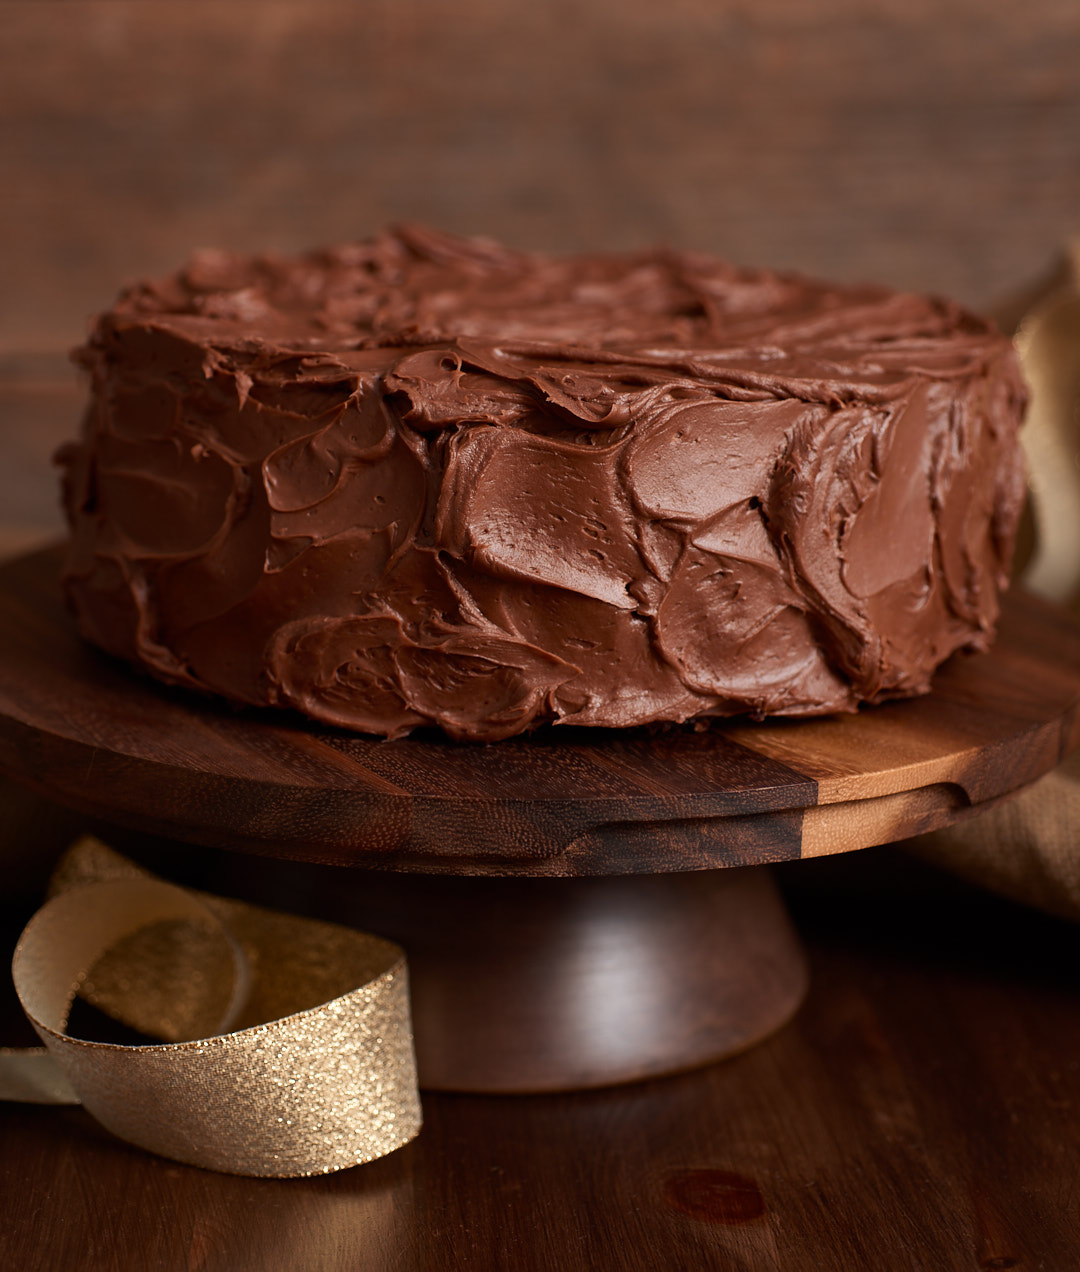 Chocolate Cake | Amy Roth Photo